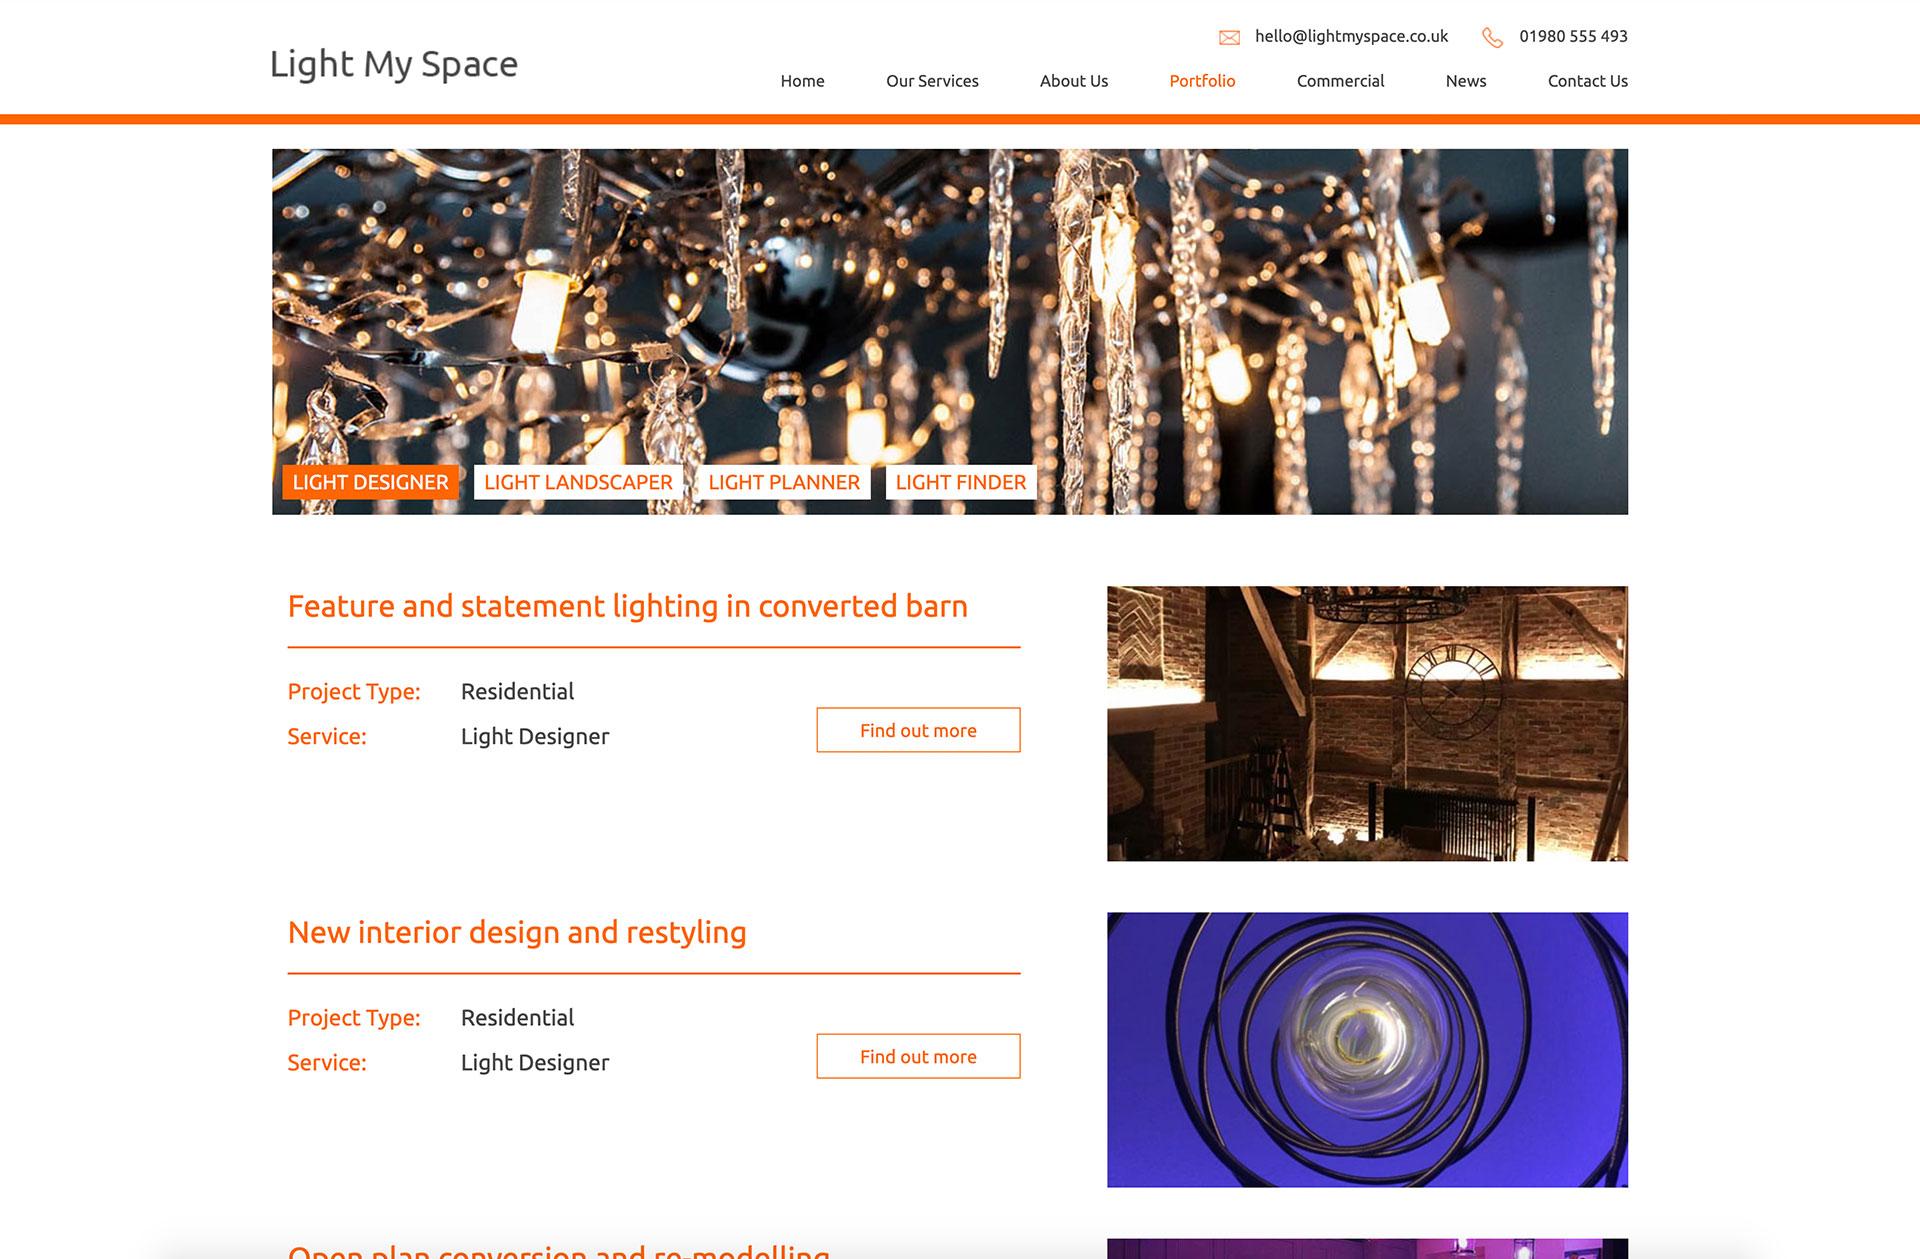 Light my space website